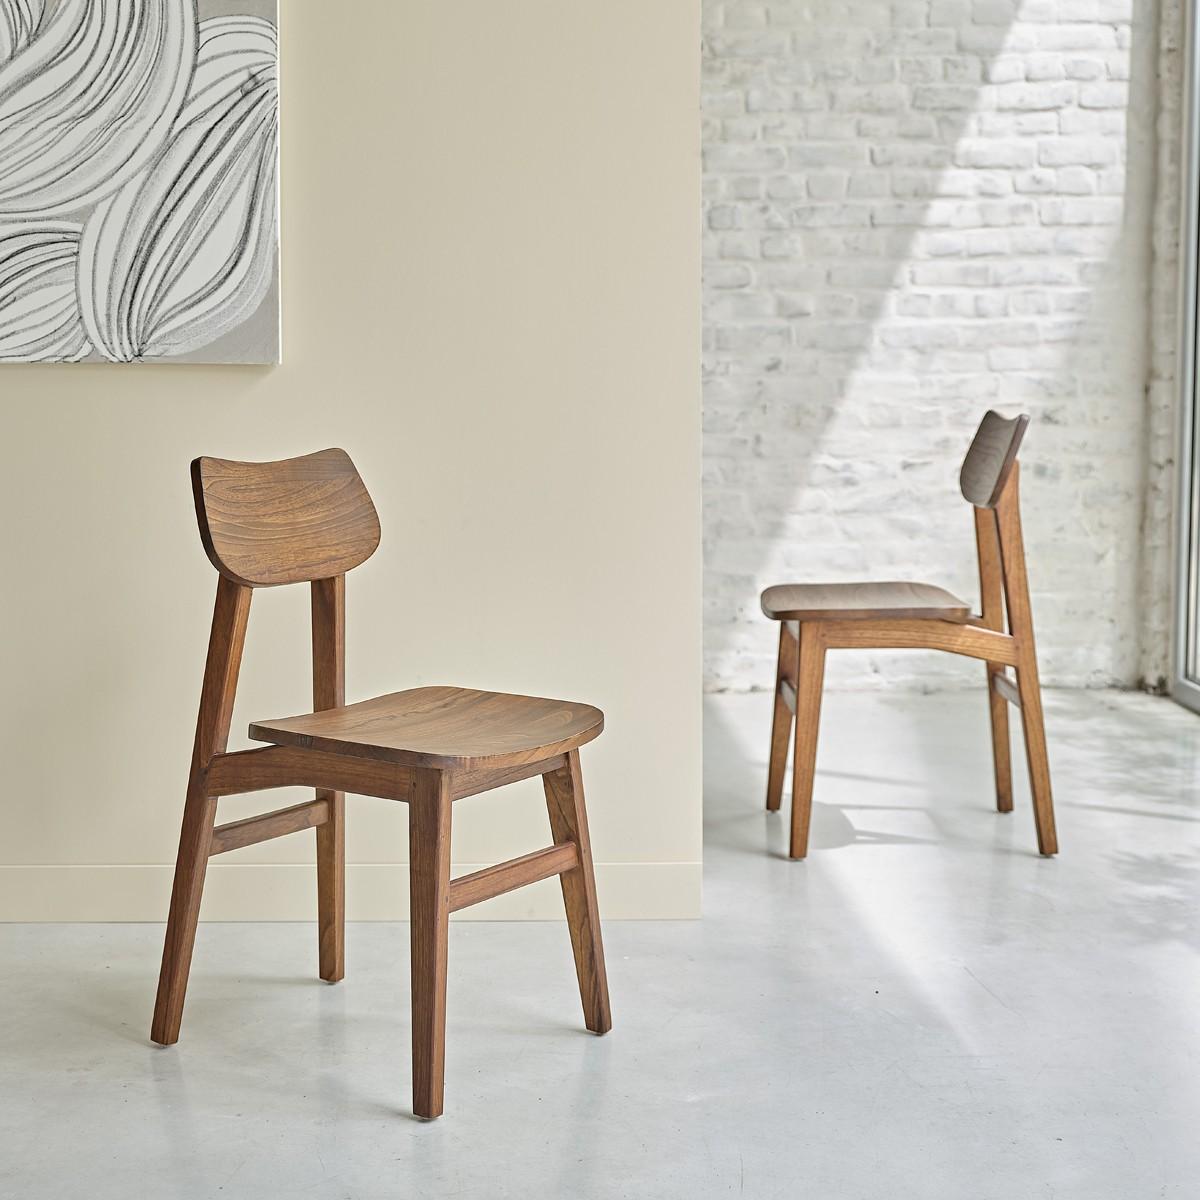 2 chaises vintage finition noyer